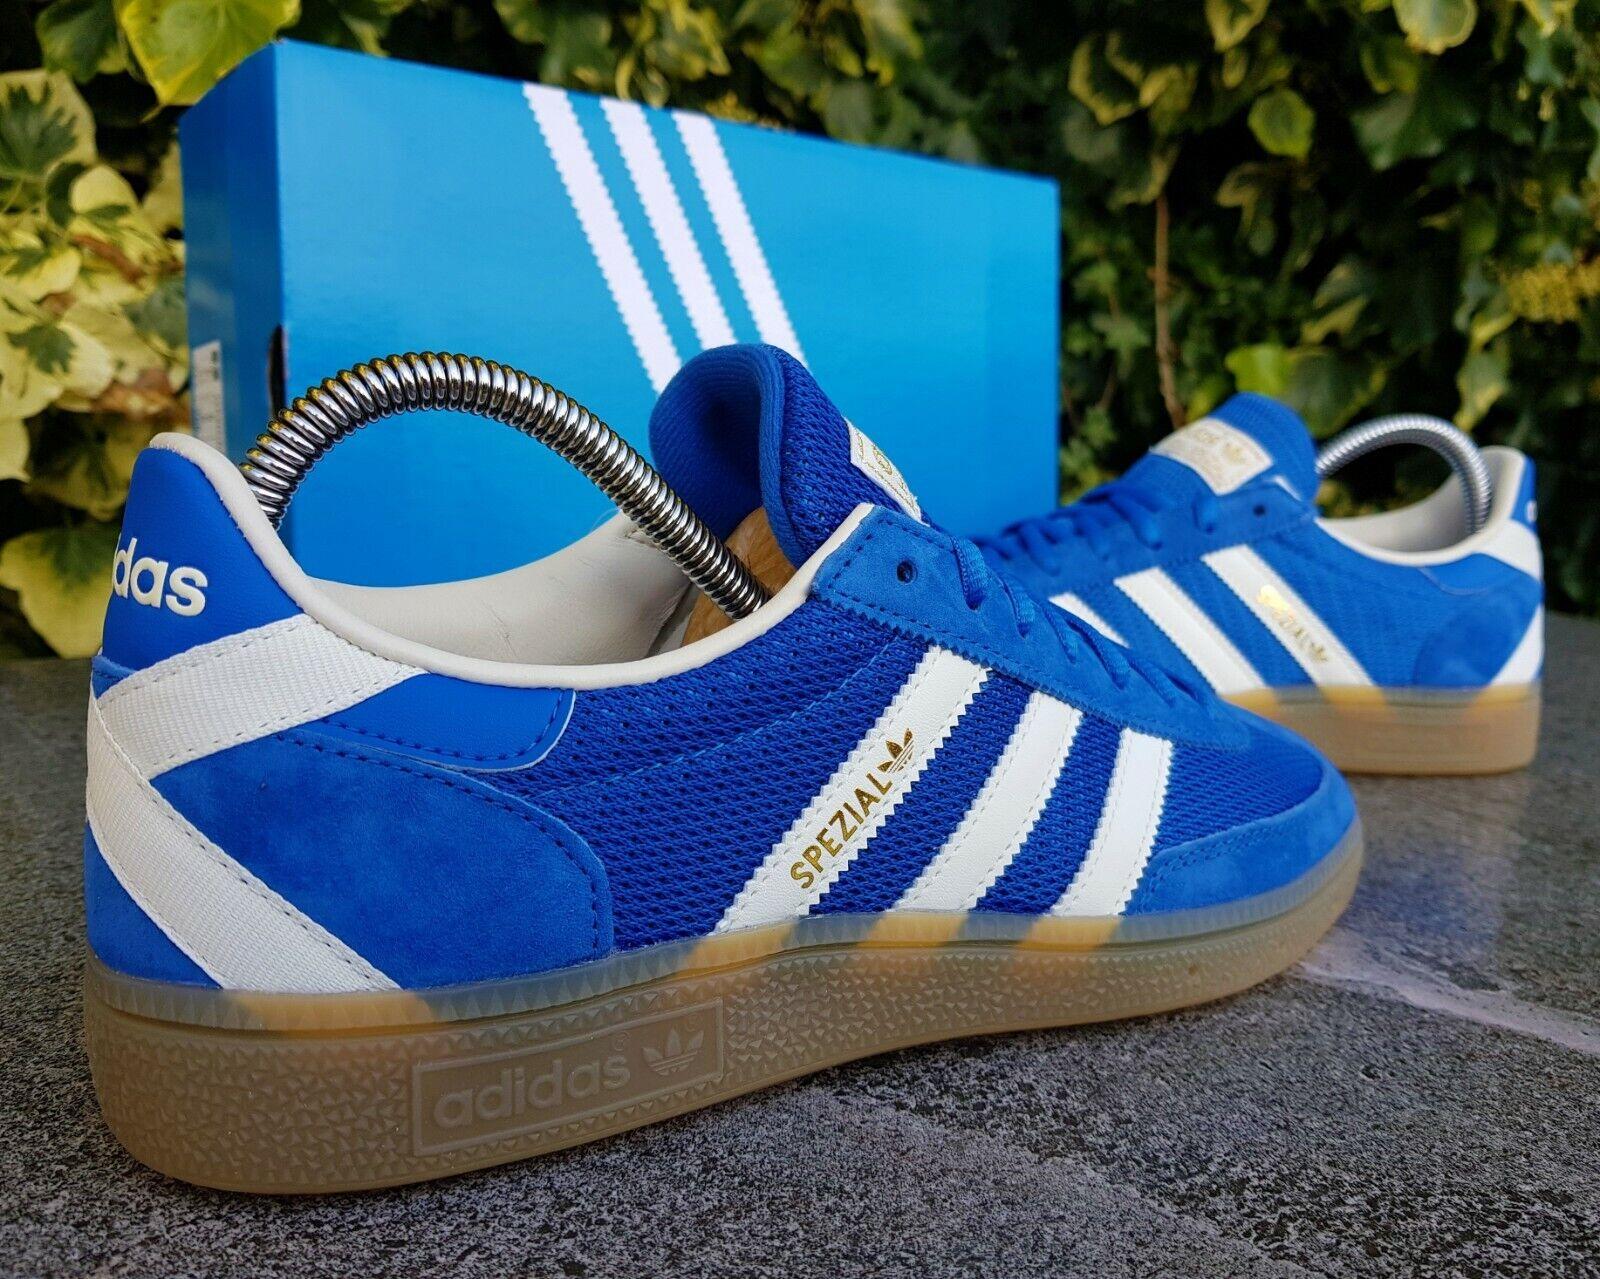 BNWB & Authentic adidas originals ® Spezial Royal Blau Weiß Trainers UK Größe 8